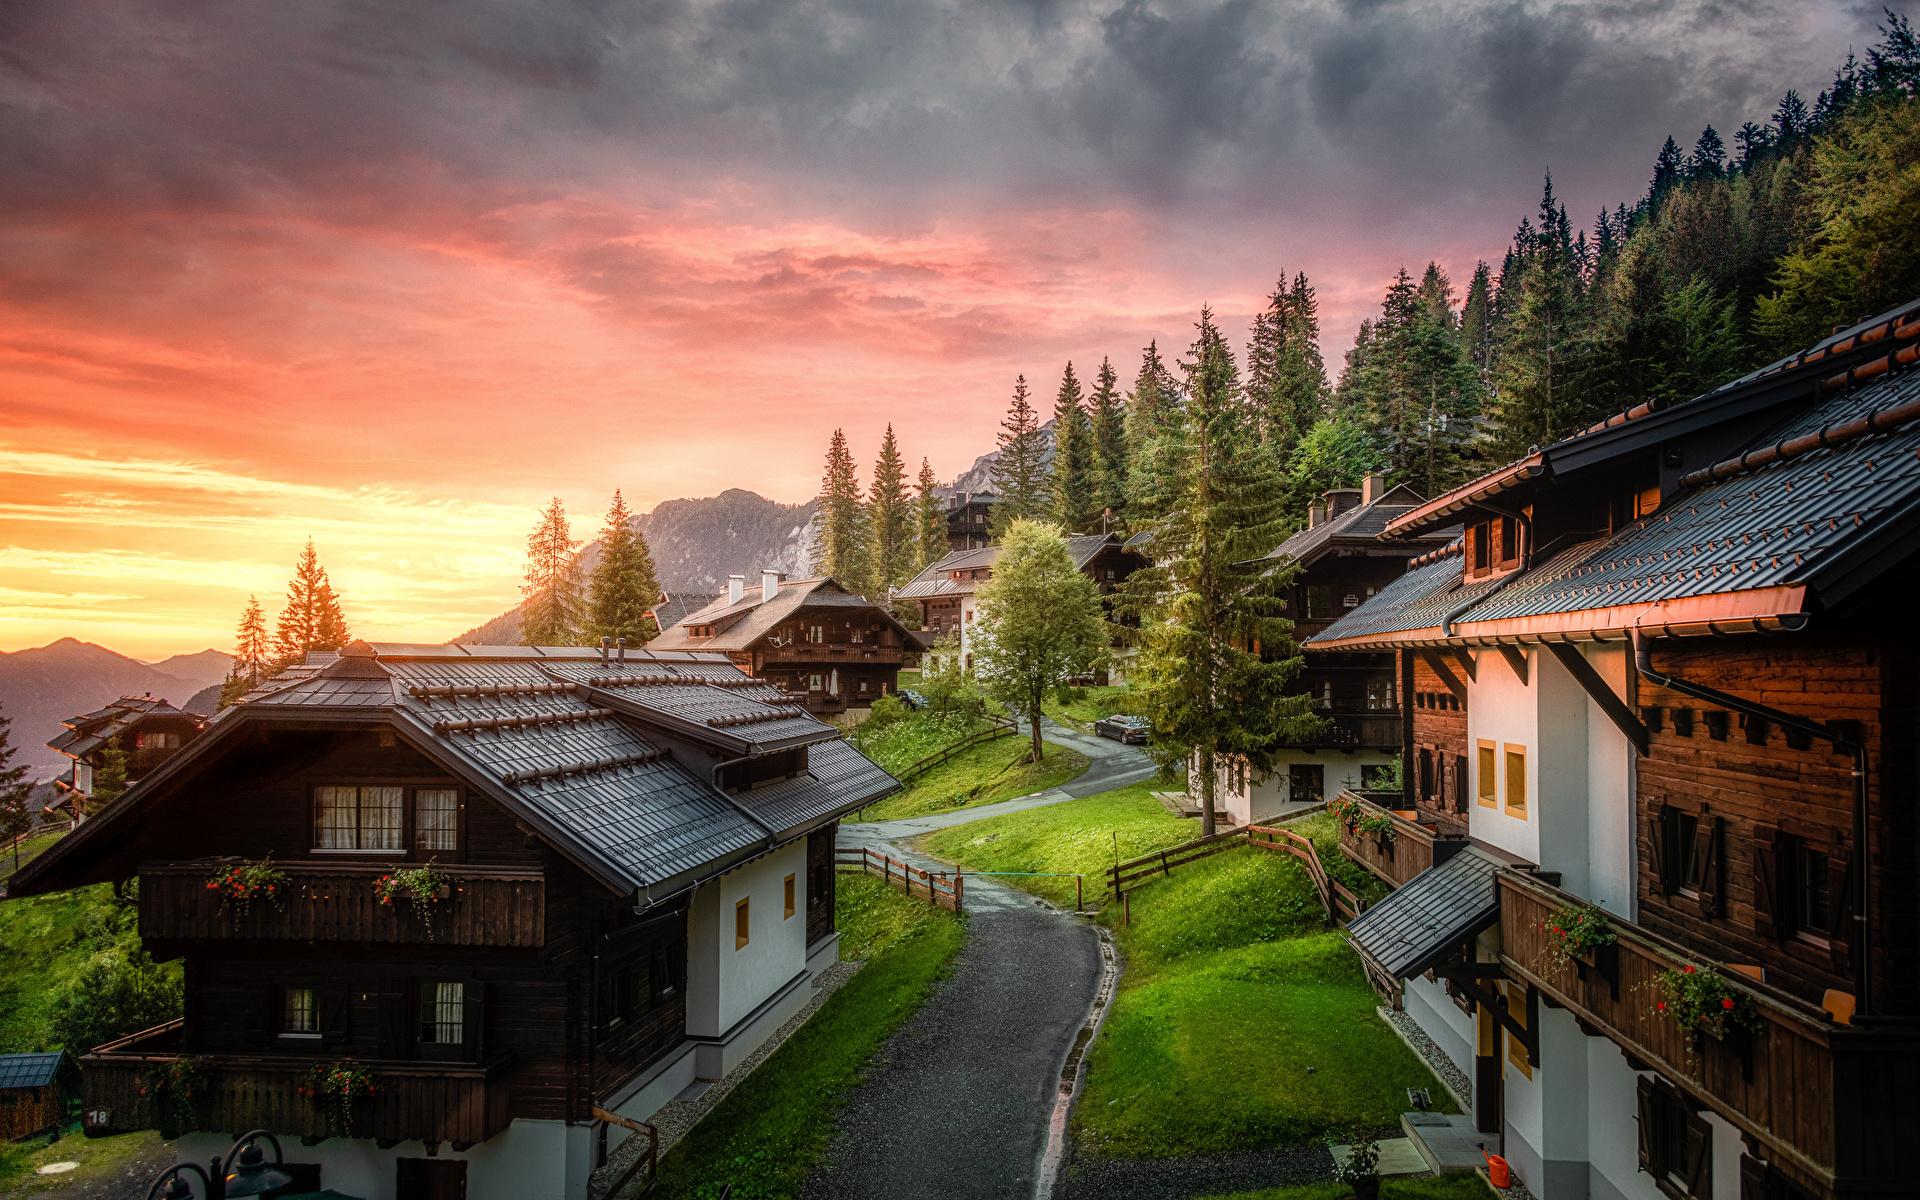 Фотография Австрия Carinthia Горы Природа Утро Дома облачно 1920x1200 гора Здания Облака облако